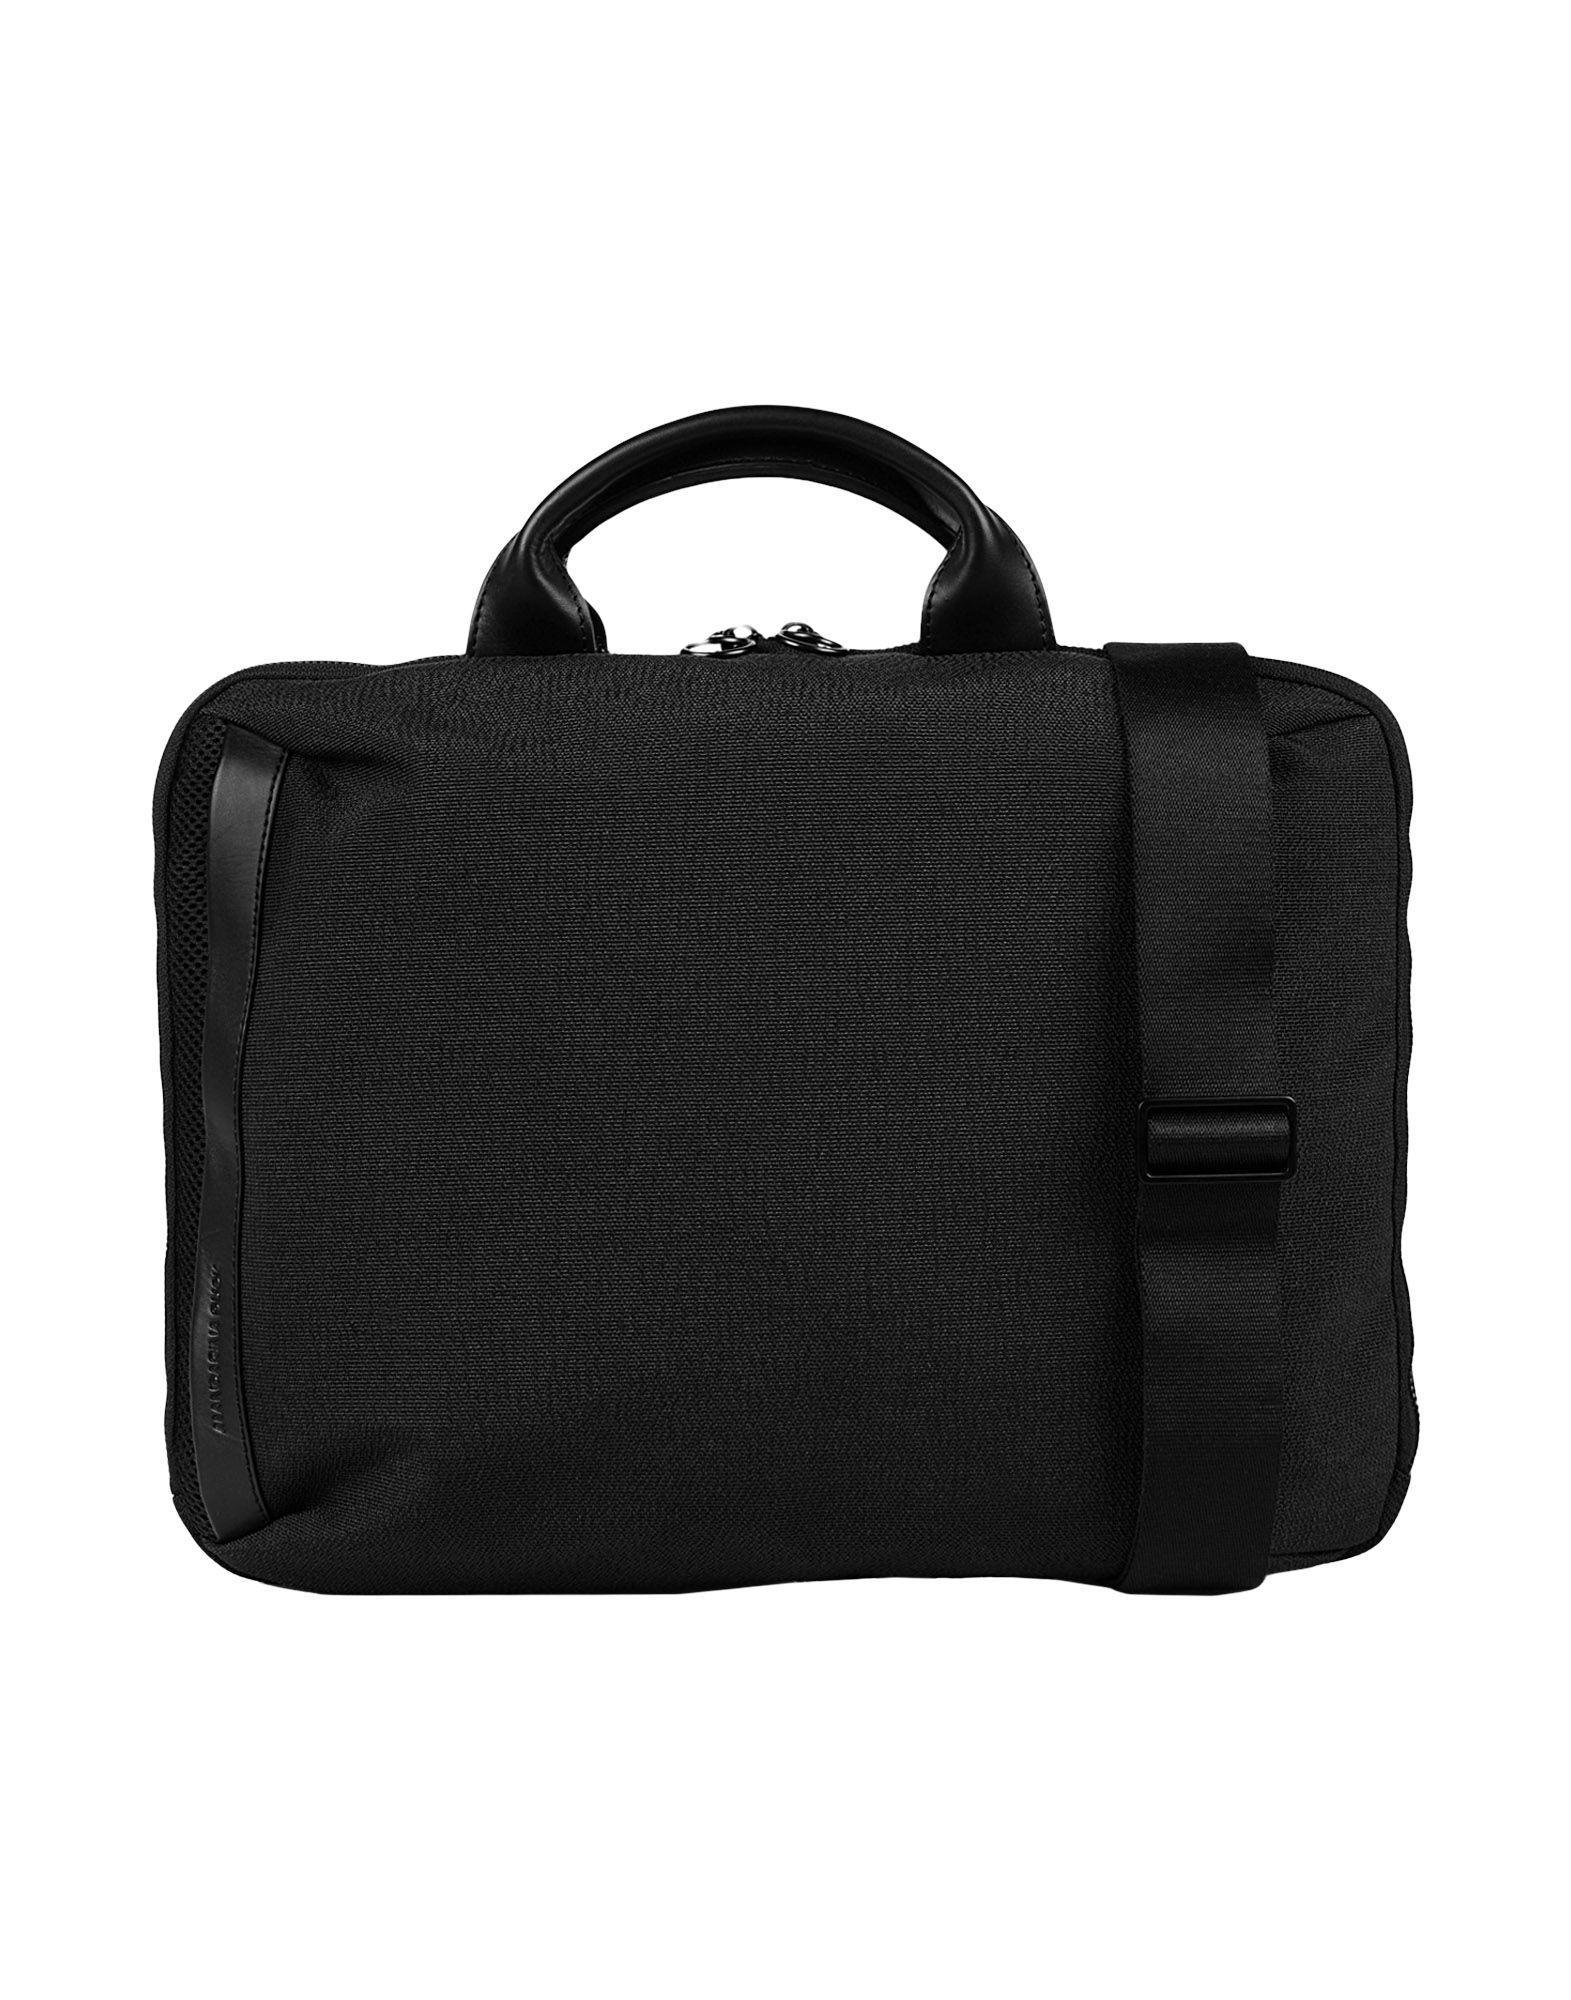 3e71631b0989 Mandarina Duck Work Bag In Black | ModeSens